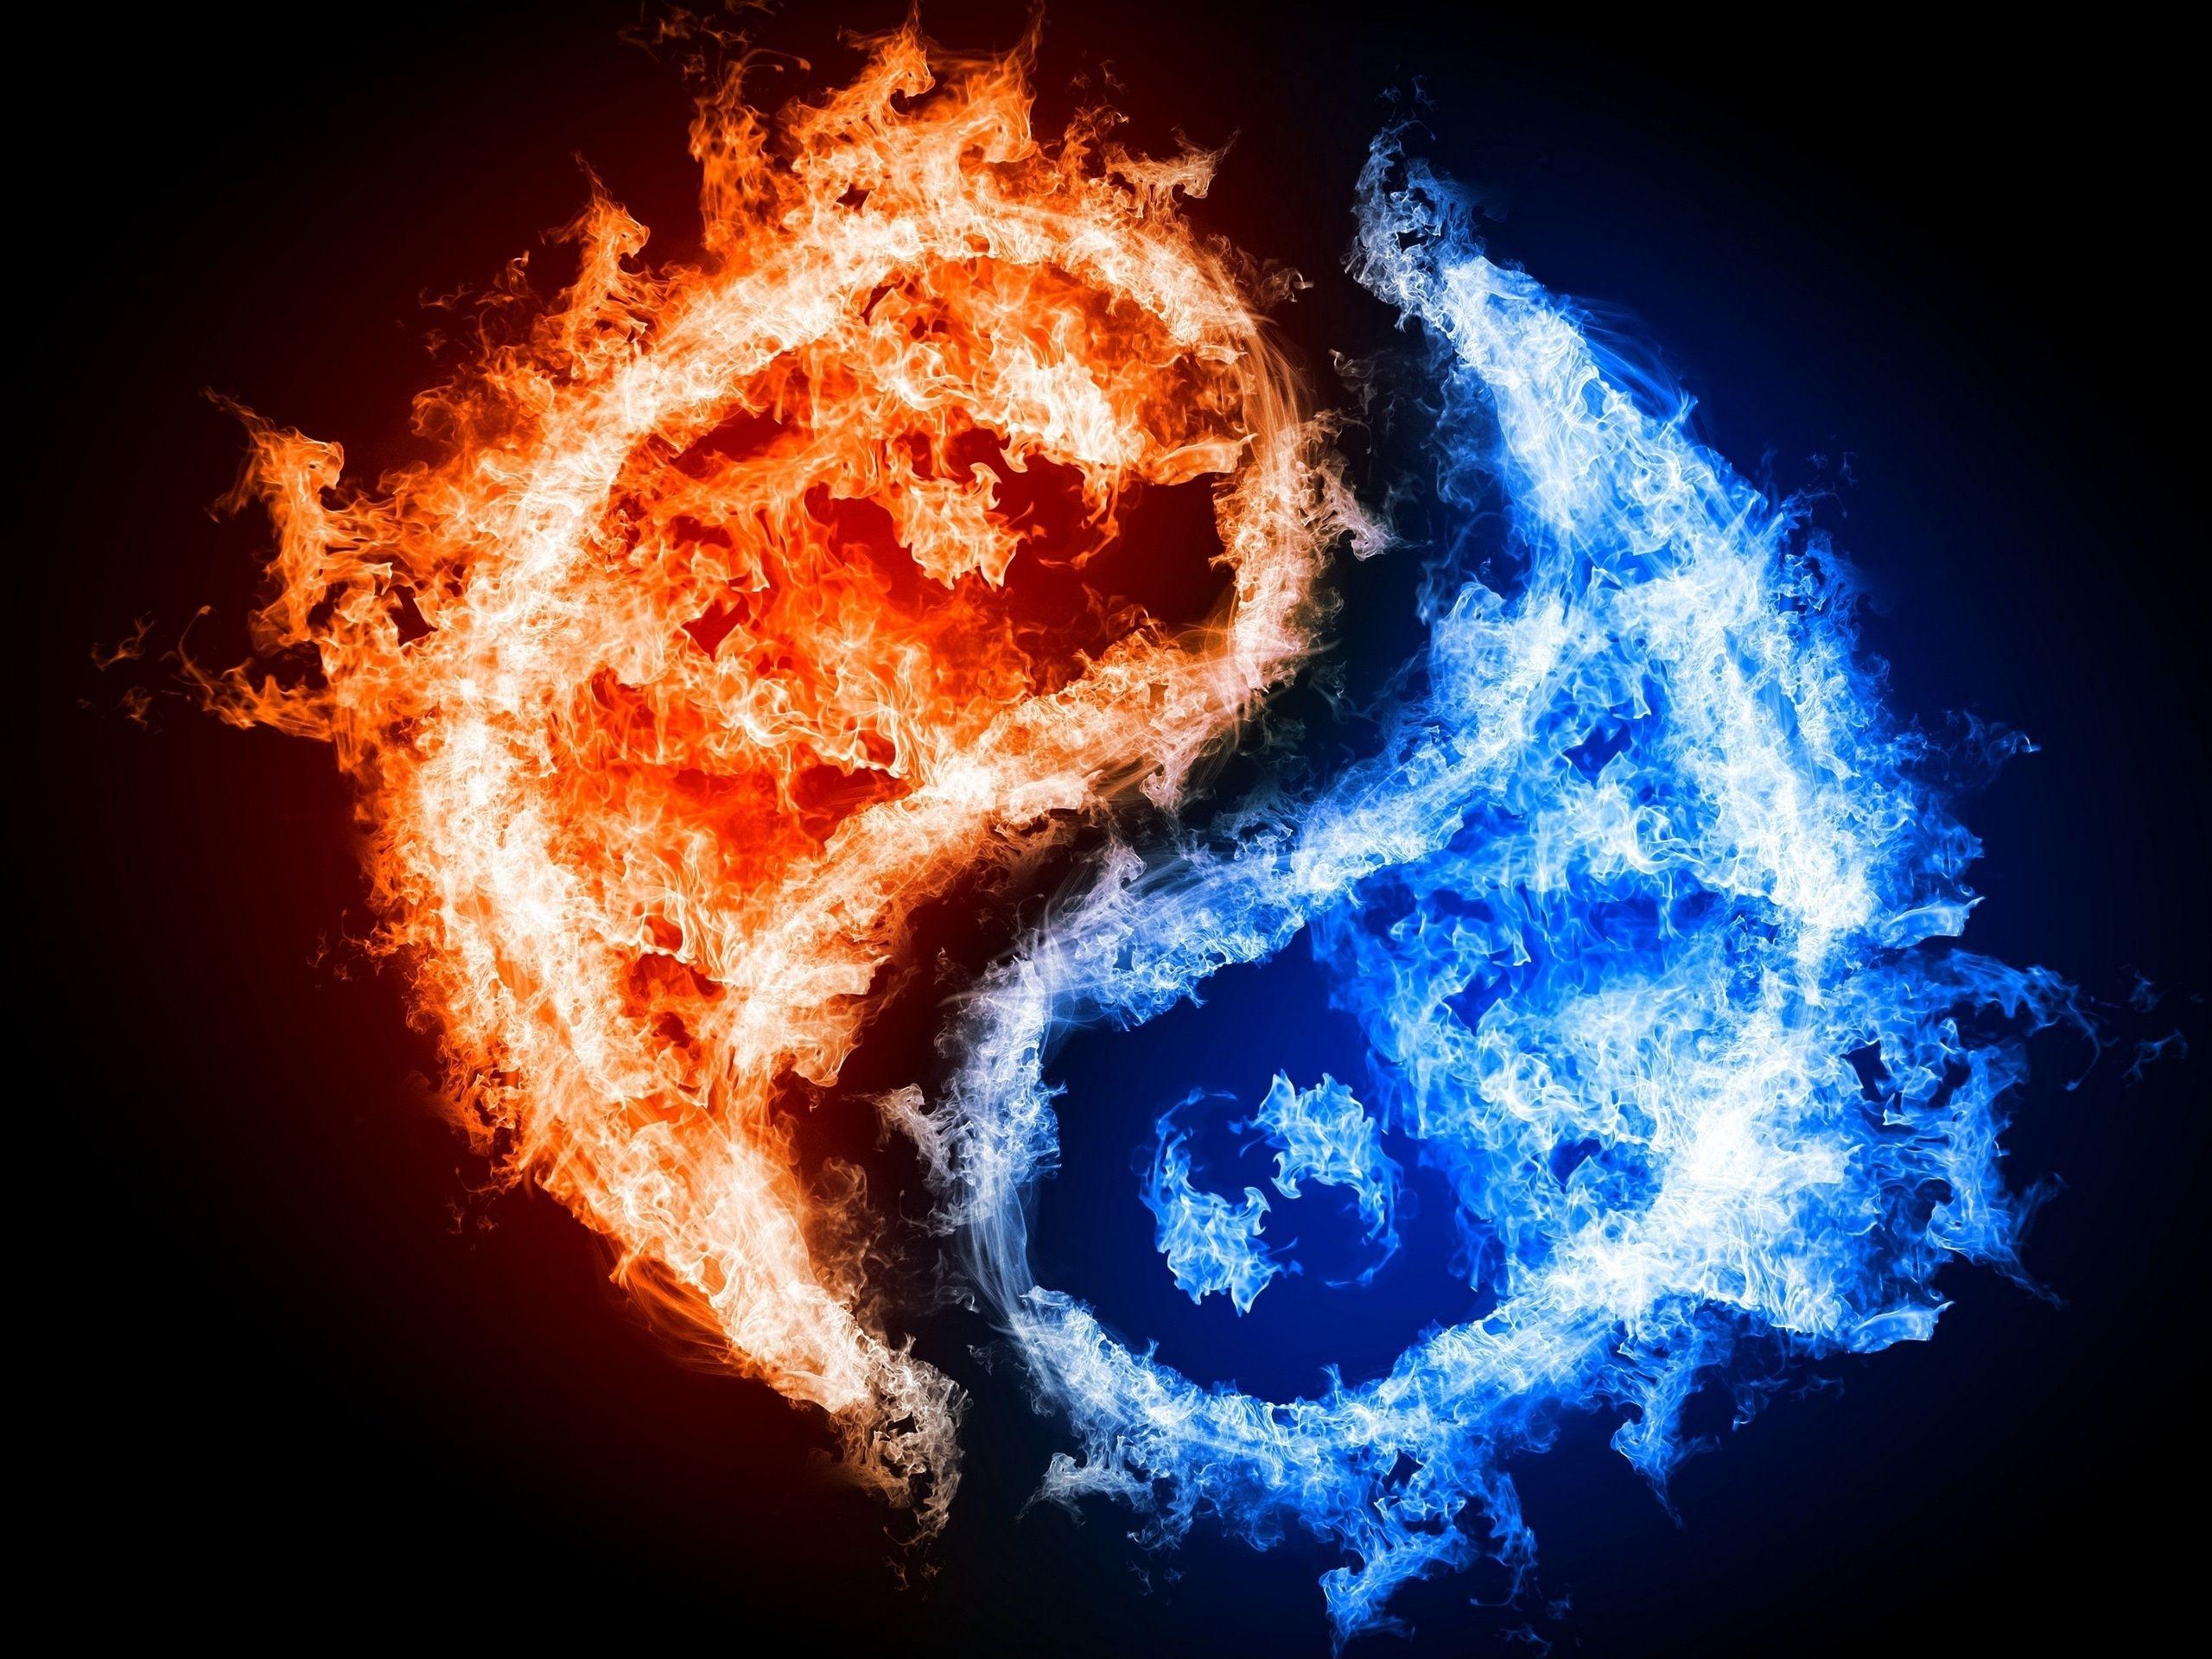 Red & Blue Fire Ying Yang | Graphics Design | Pinterest | Yin yang ...